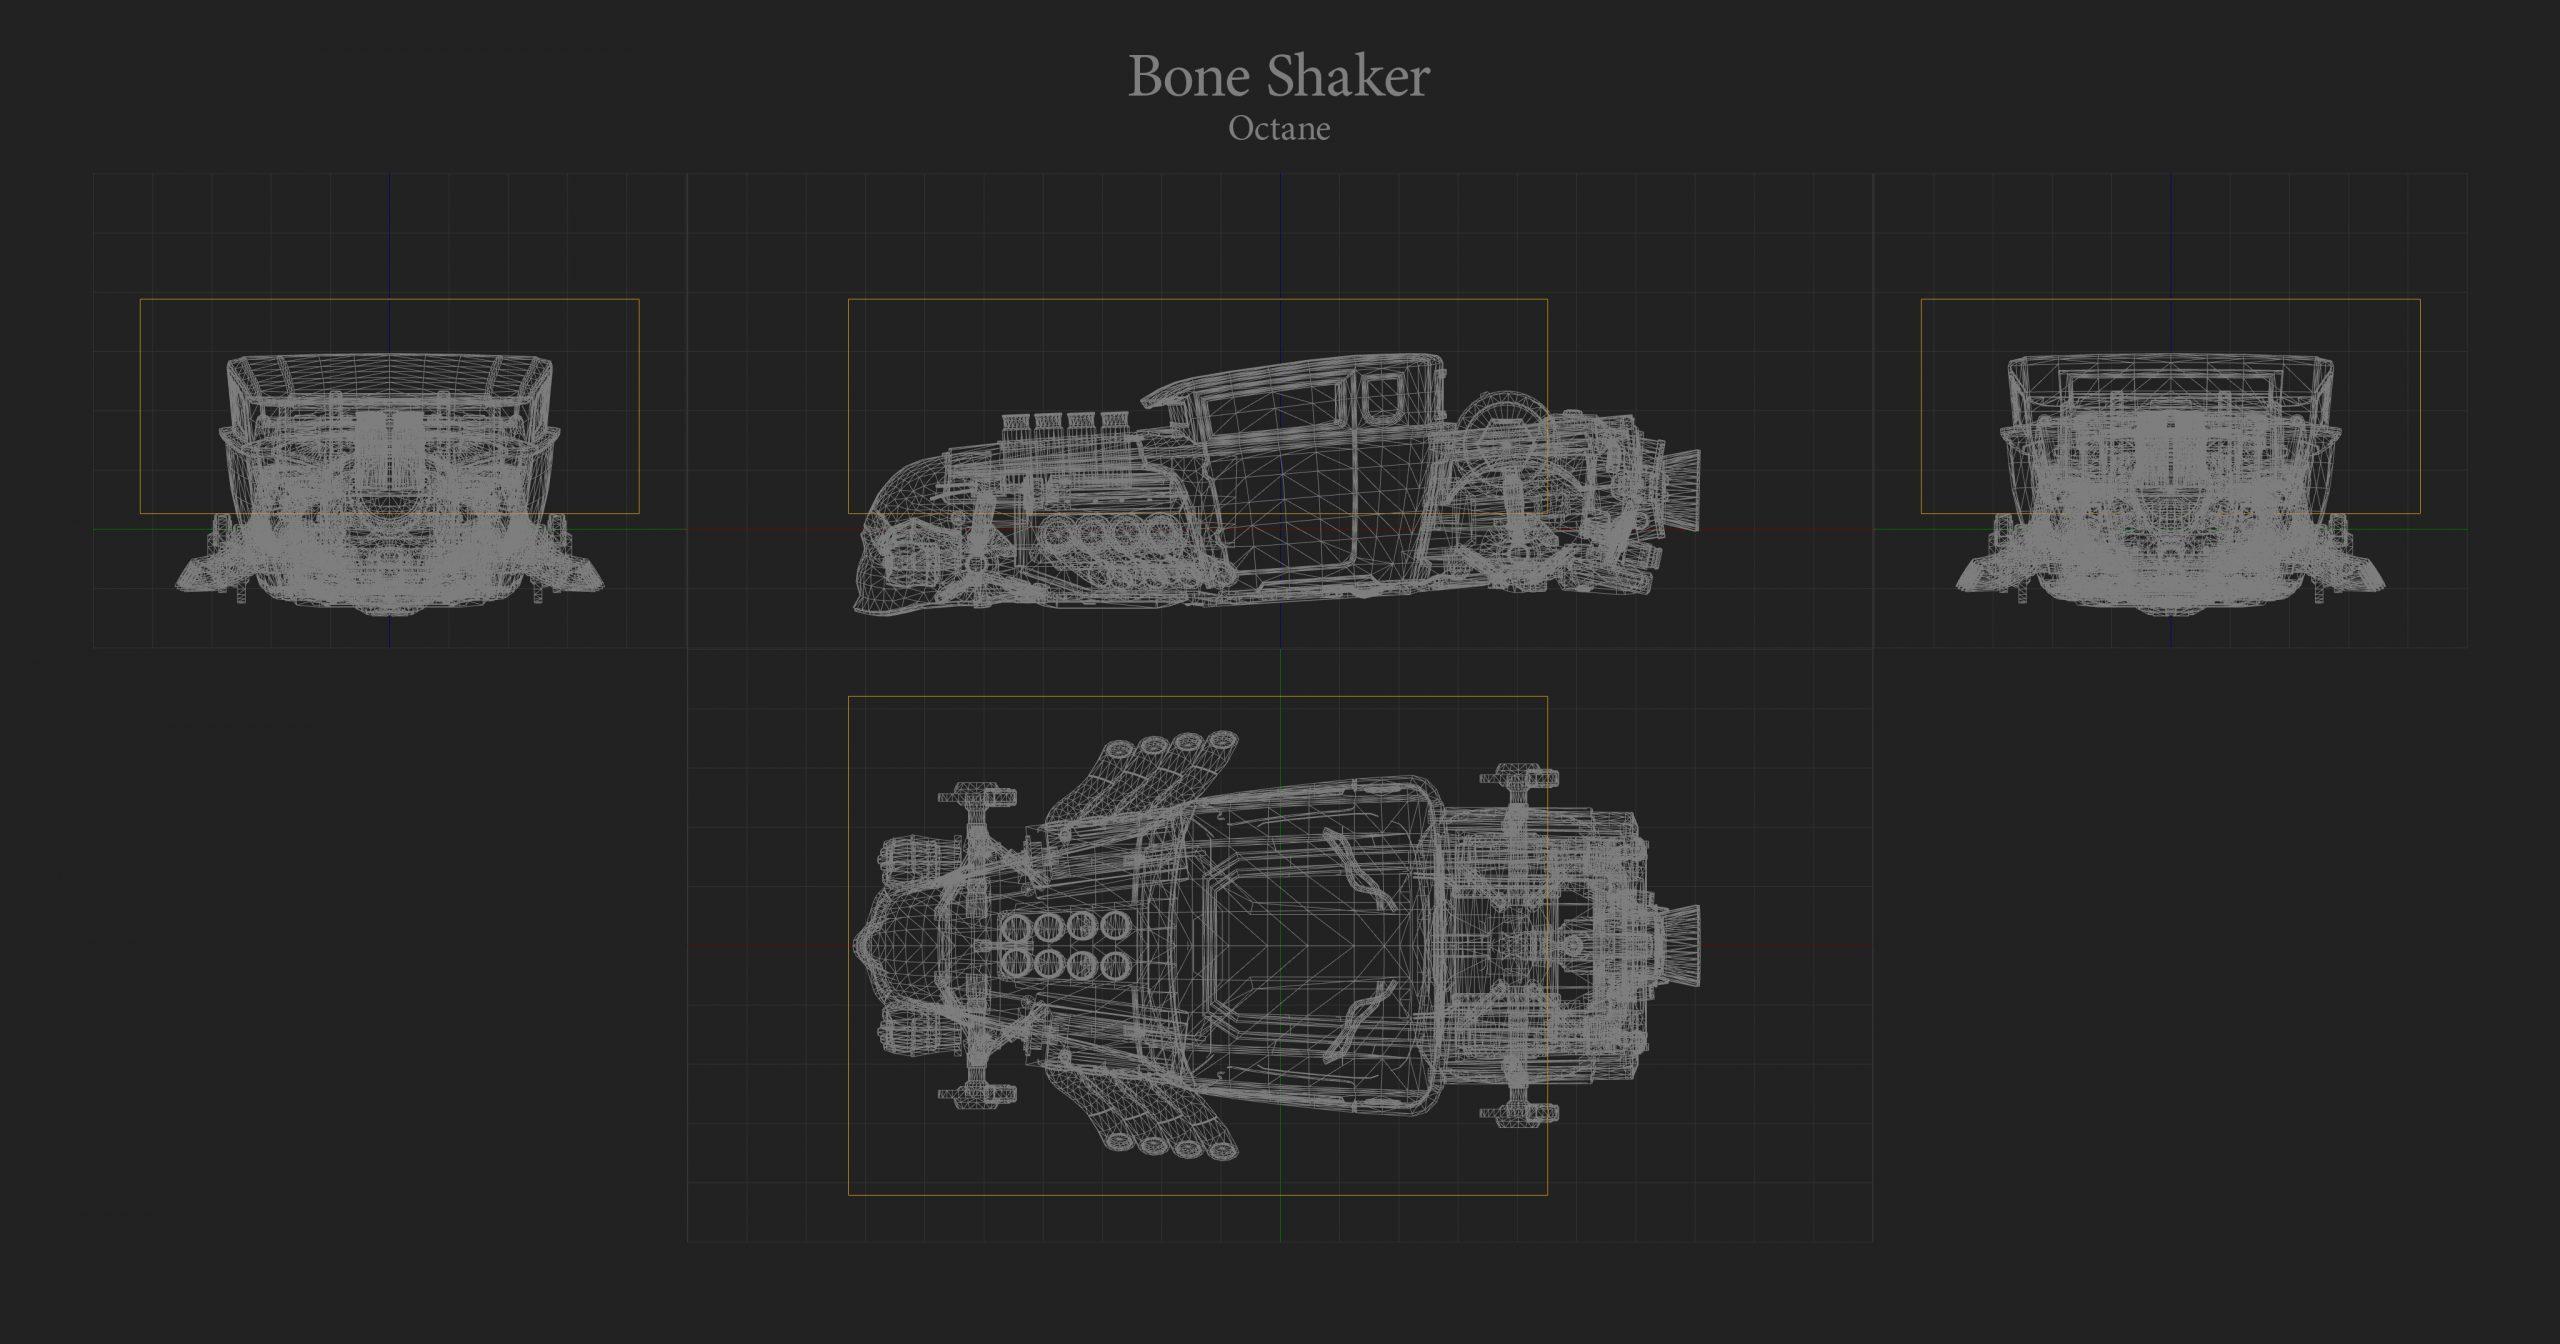 Boneshaker Hitbox Rocket League